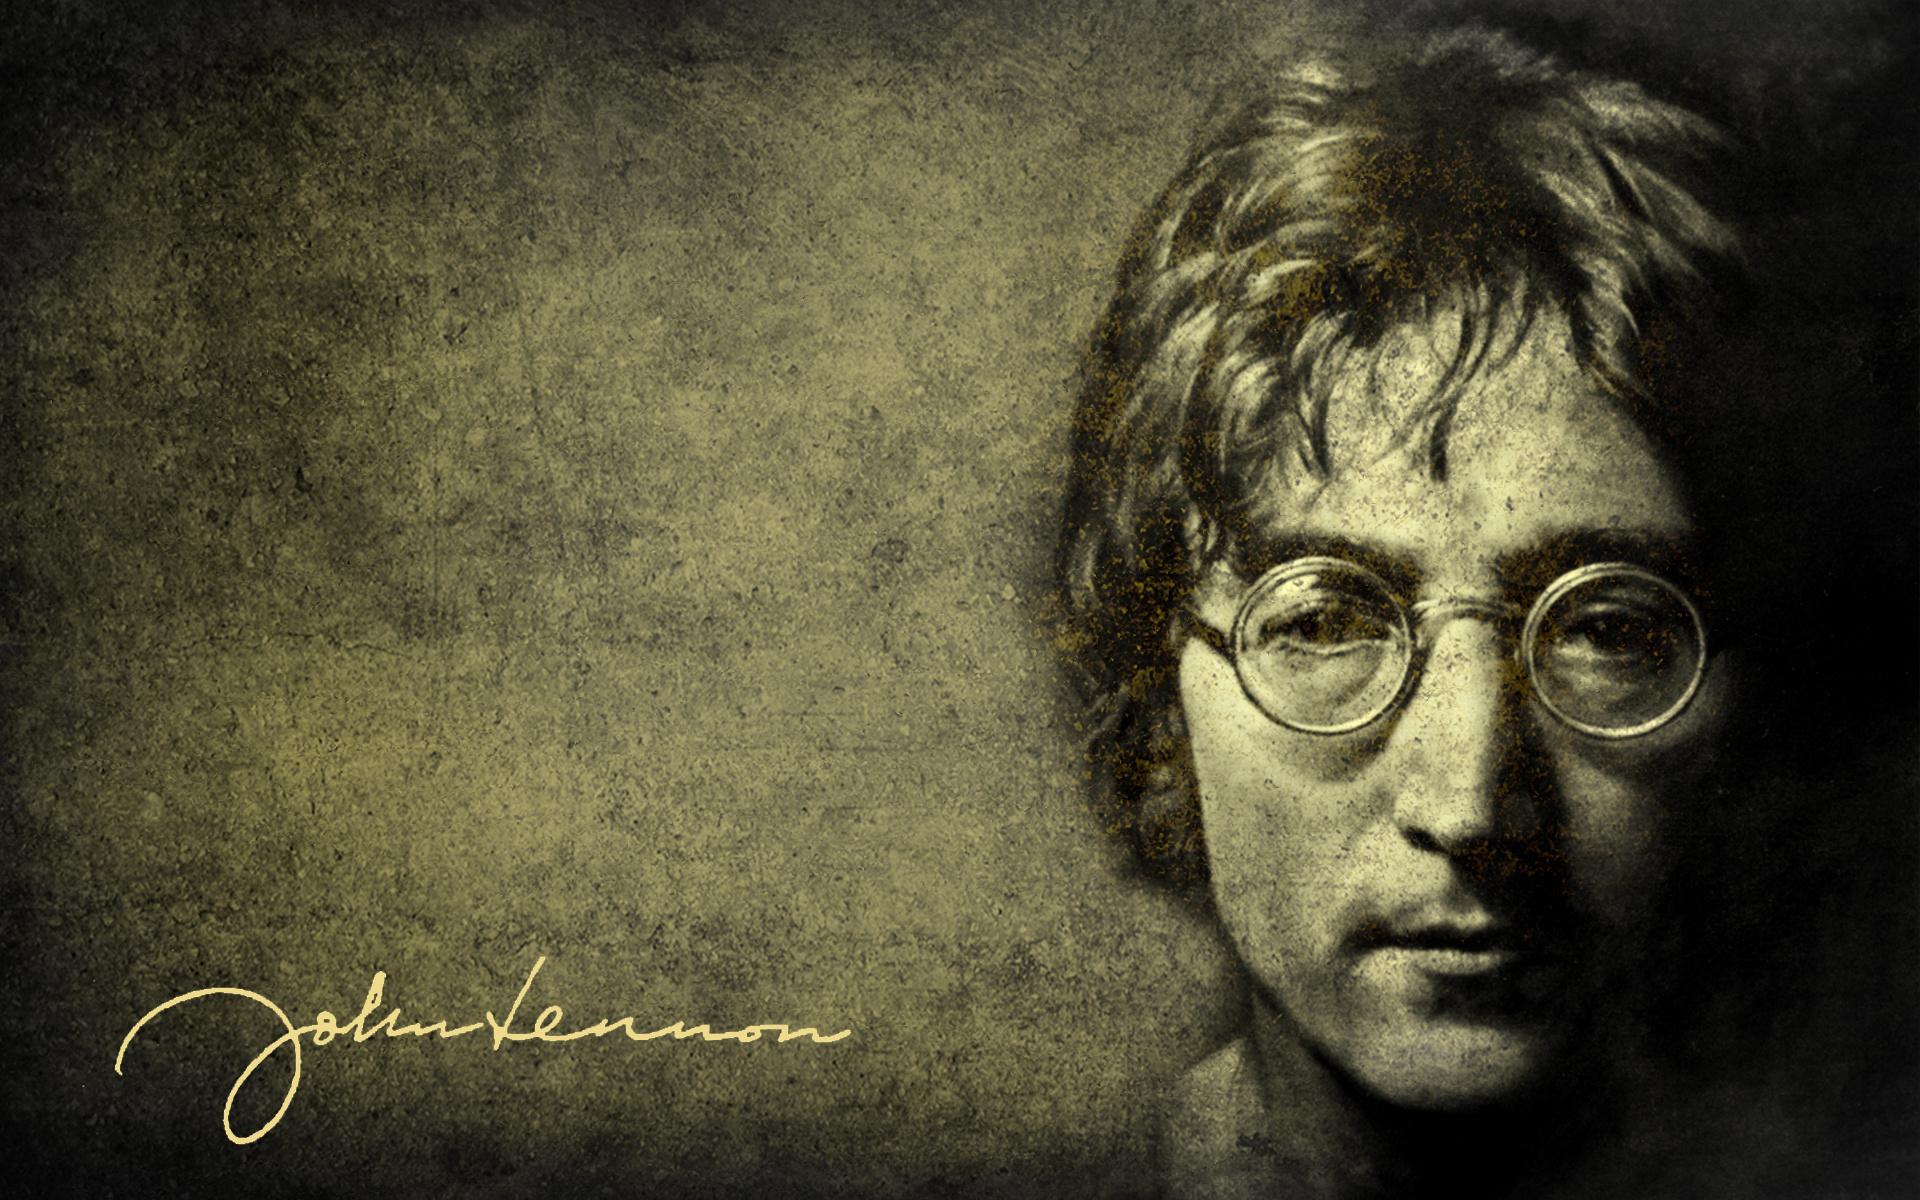 HAPPY 75TH JOHN LENNON John-Lennon-john-lennon-29017764-1920-1200